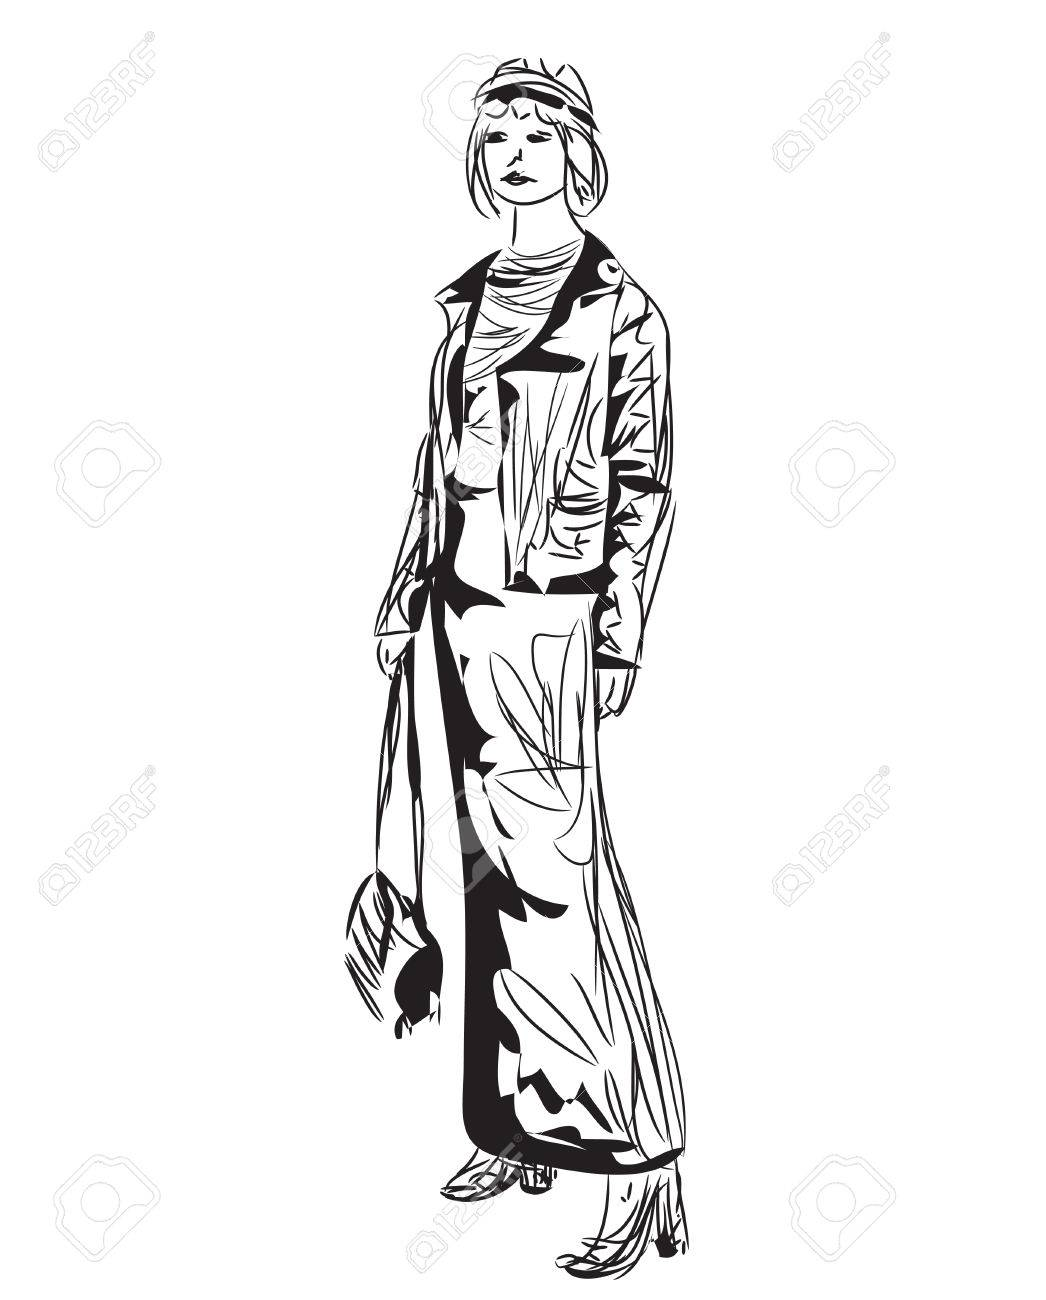 1046x1300 Fashion Model Sketch. Cartoon Girl. Woman In The Dress Royalty